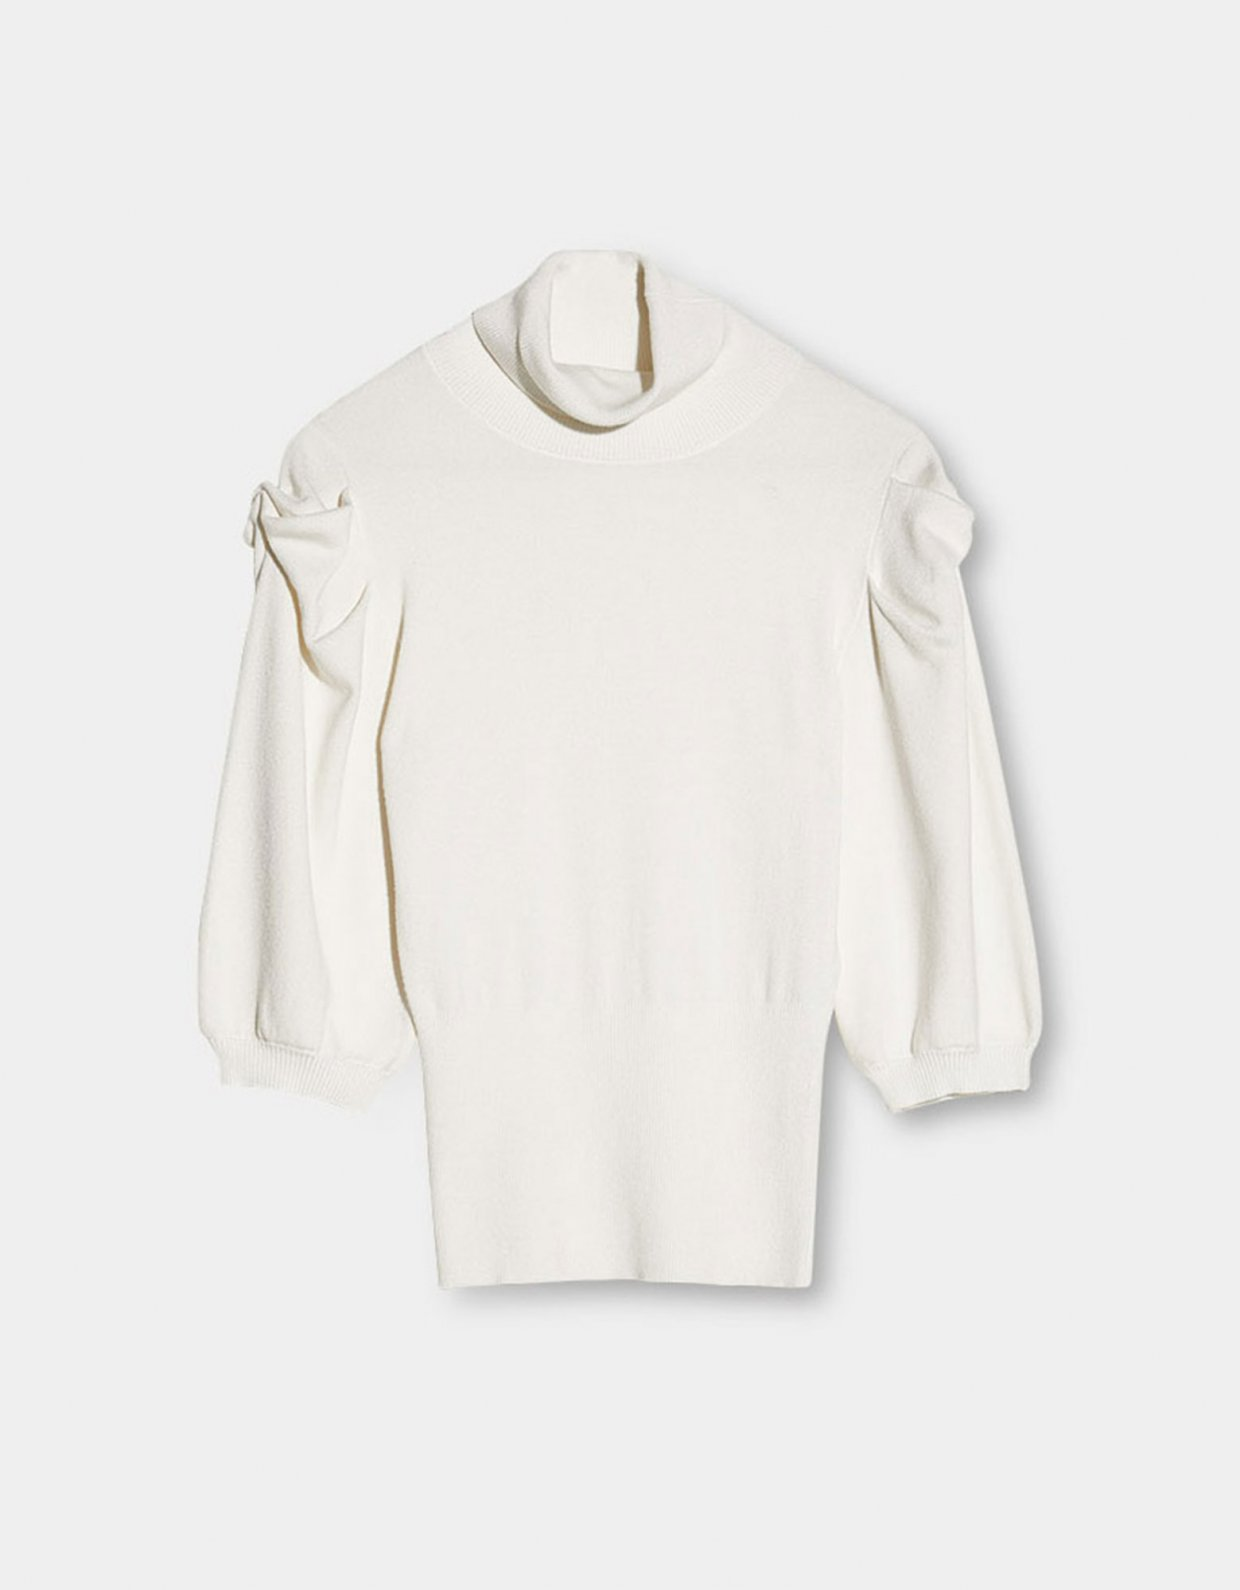 Liu Jo Knit turtleneck bianco